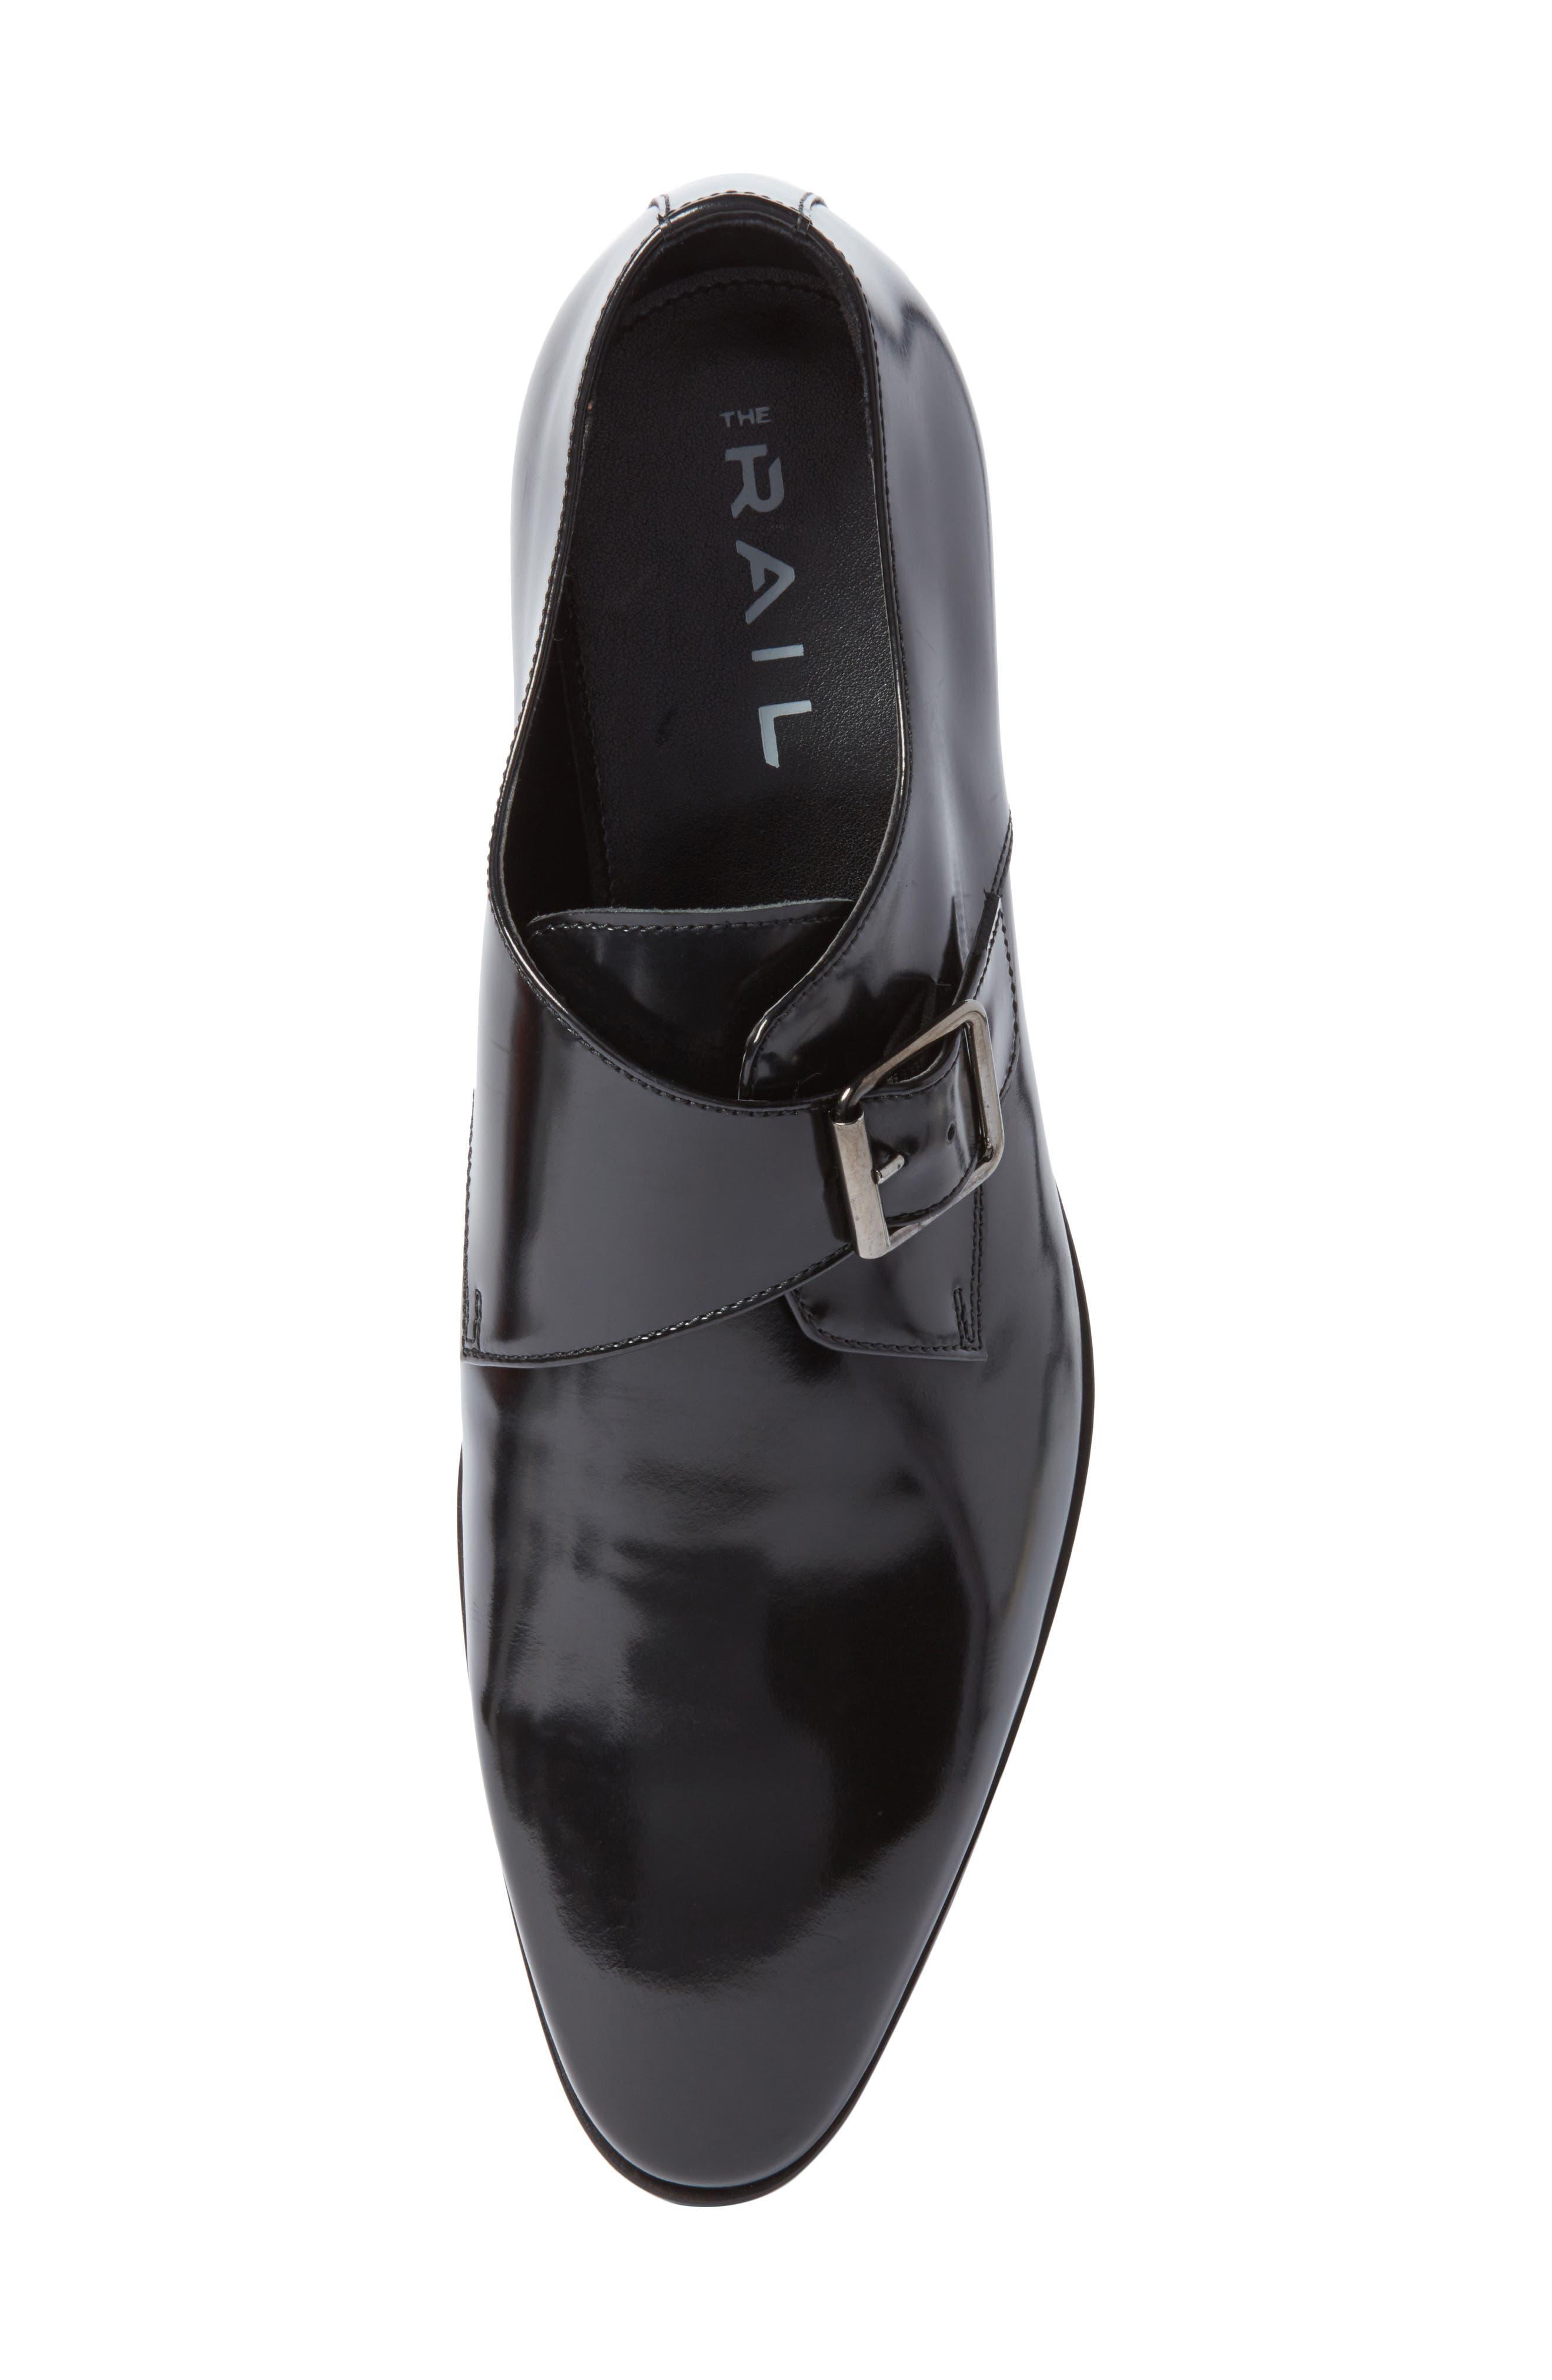 Webster Single Strap Monk Shoe,                             Alternate thumbnail 5, color,                             001